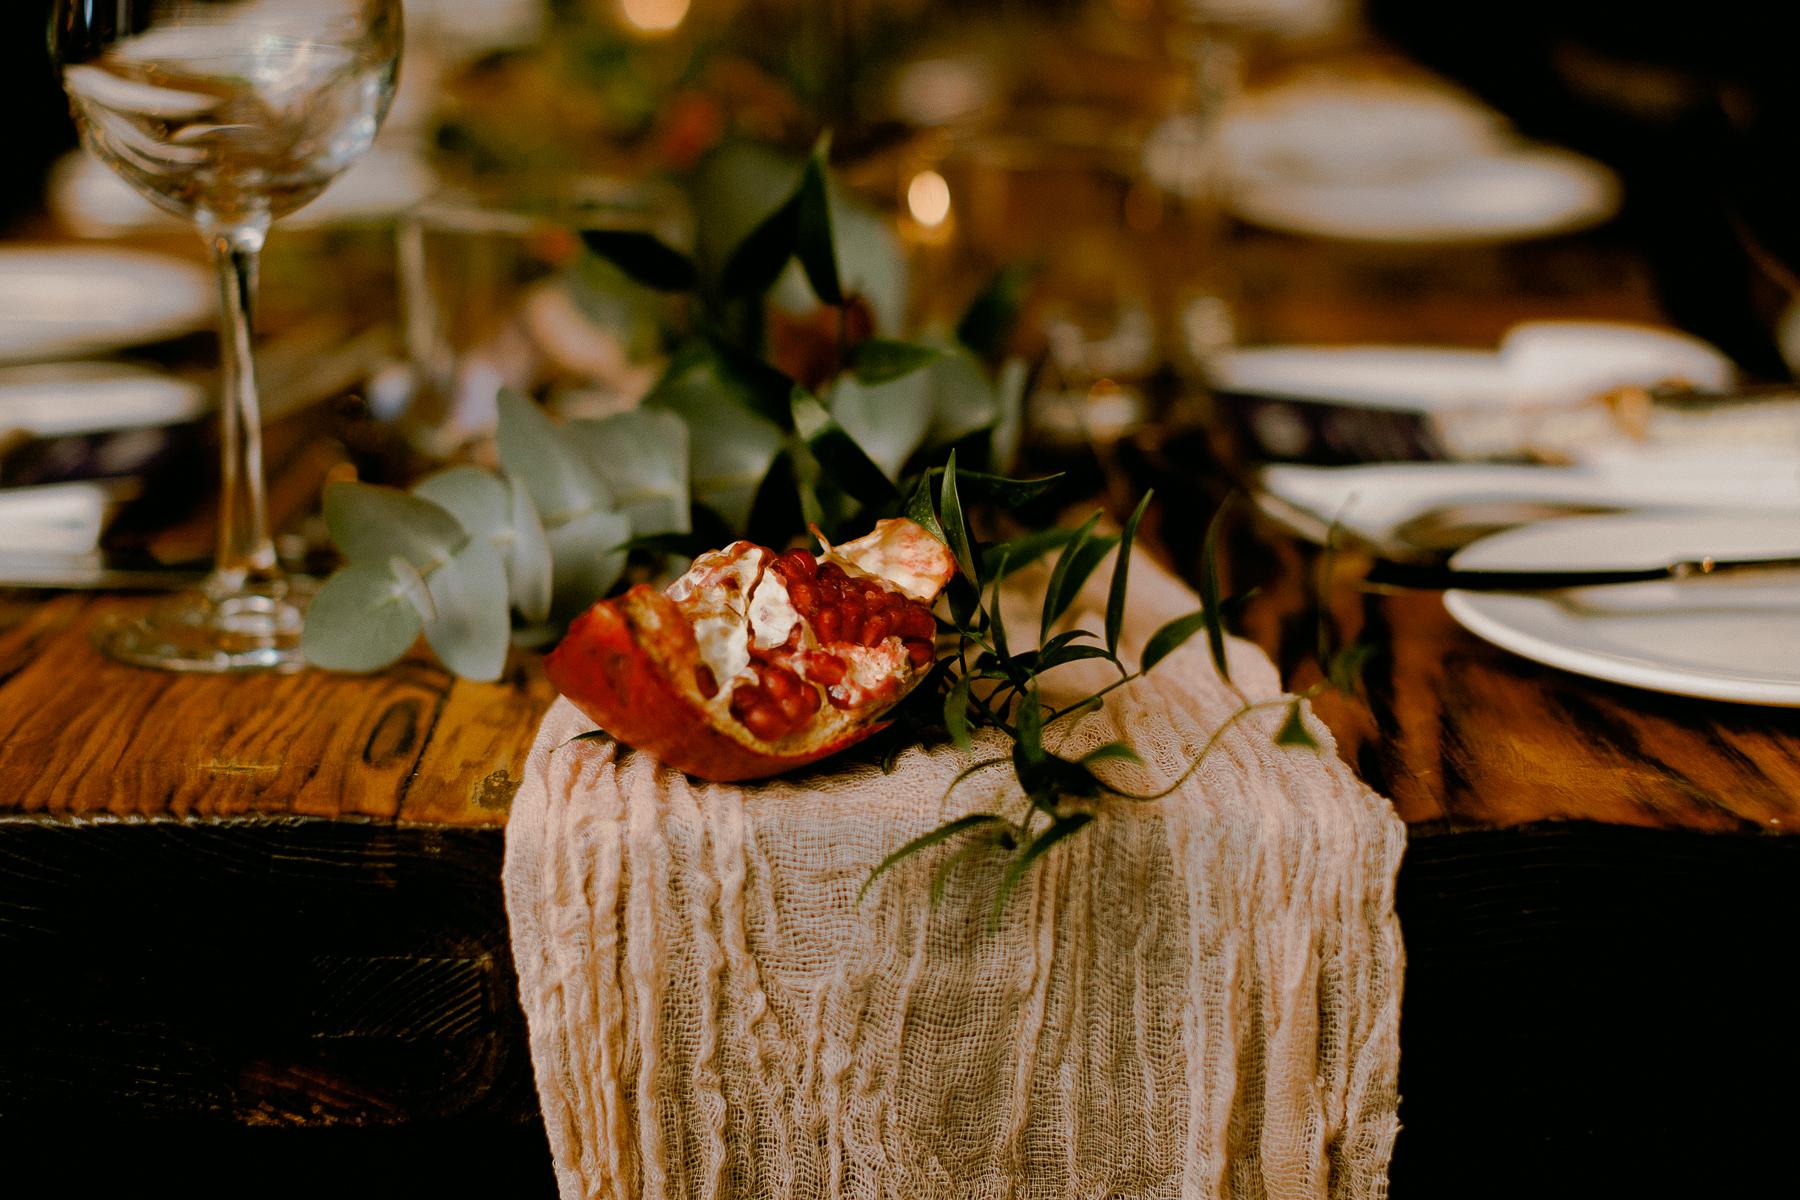 flower-decoration-for-wedding-reception 0006.jpg